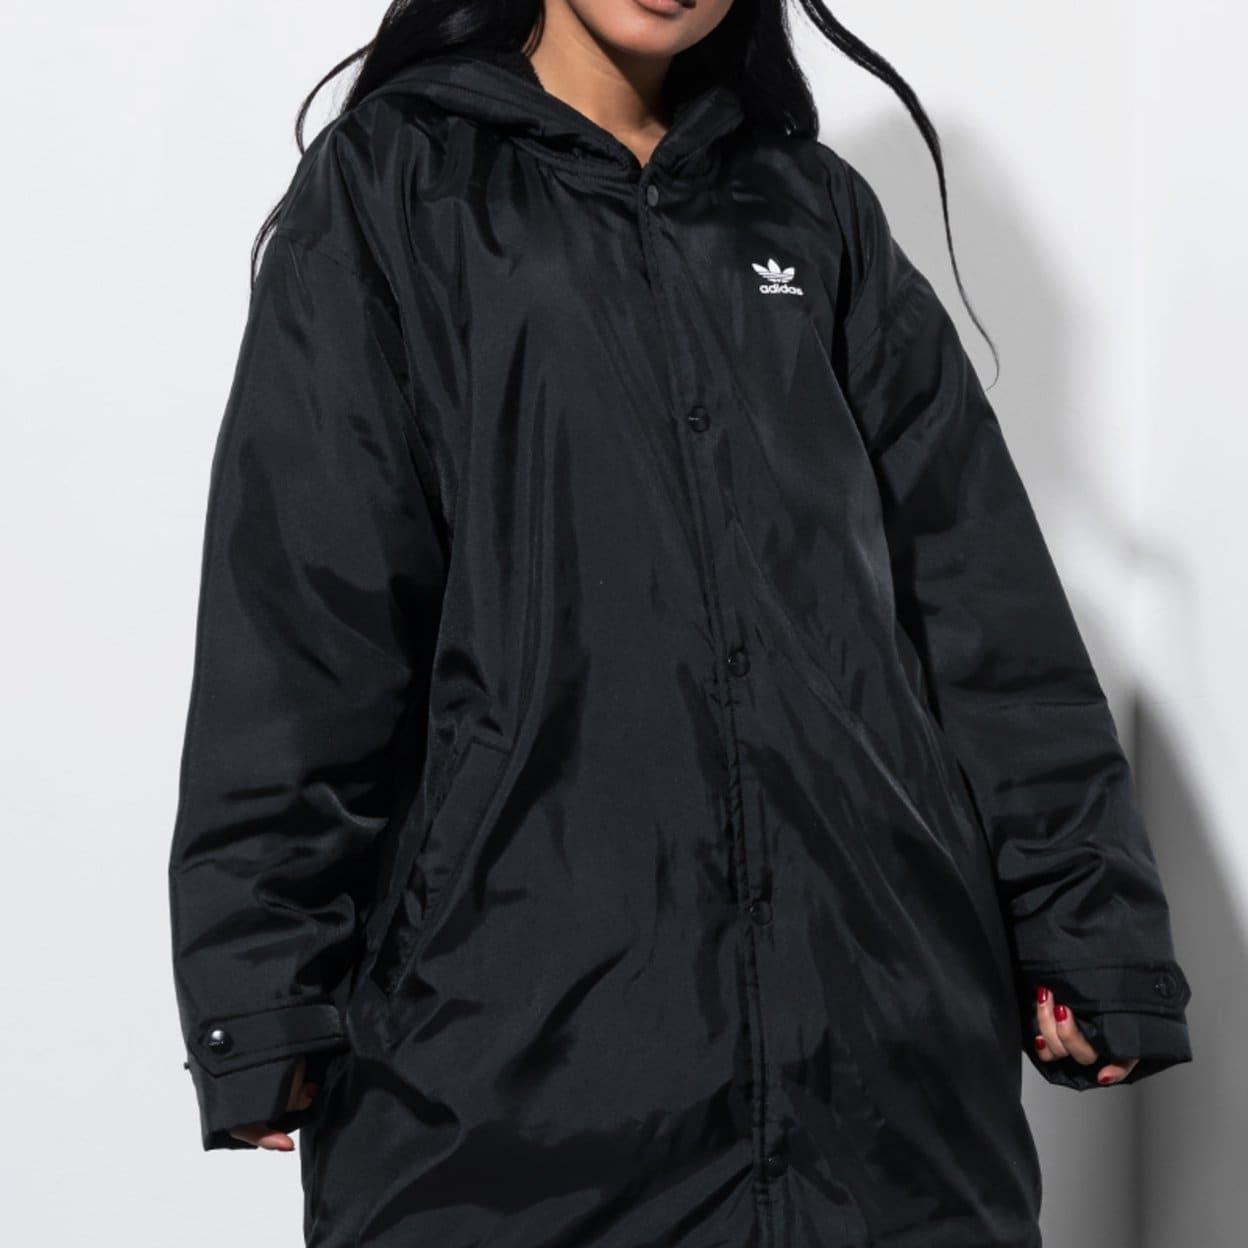 promo code 935dc ad787 Shop Adidas Adicolor Jacket - Free Shipping Today - - 274283